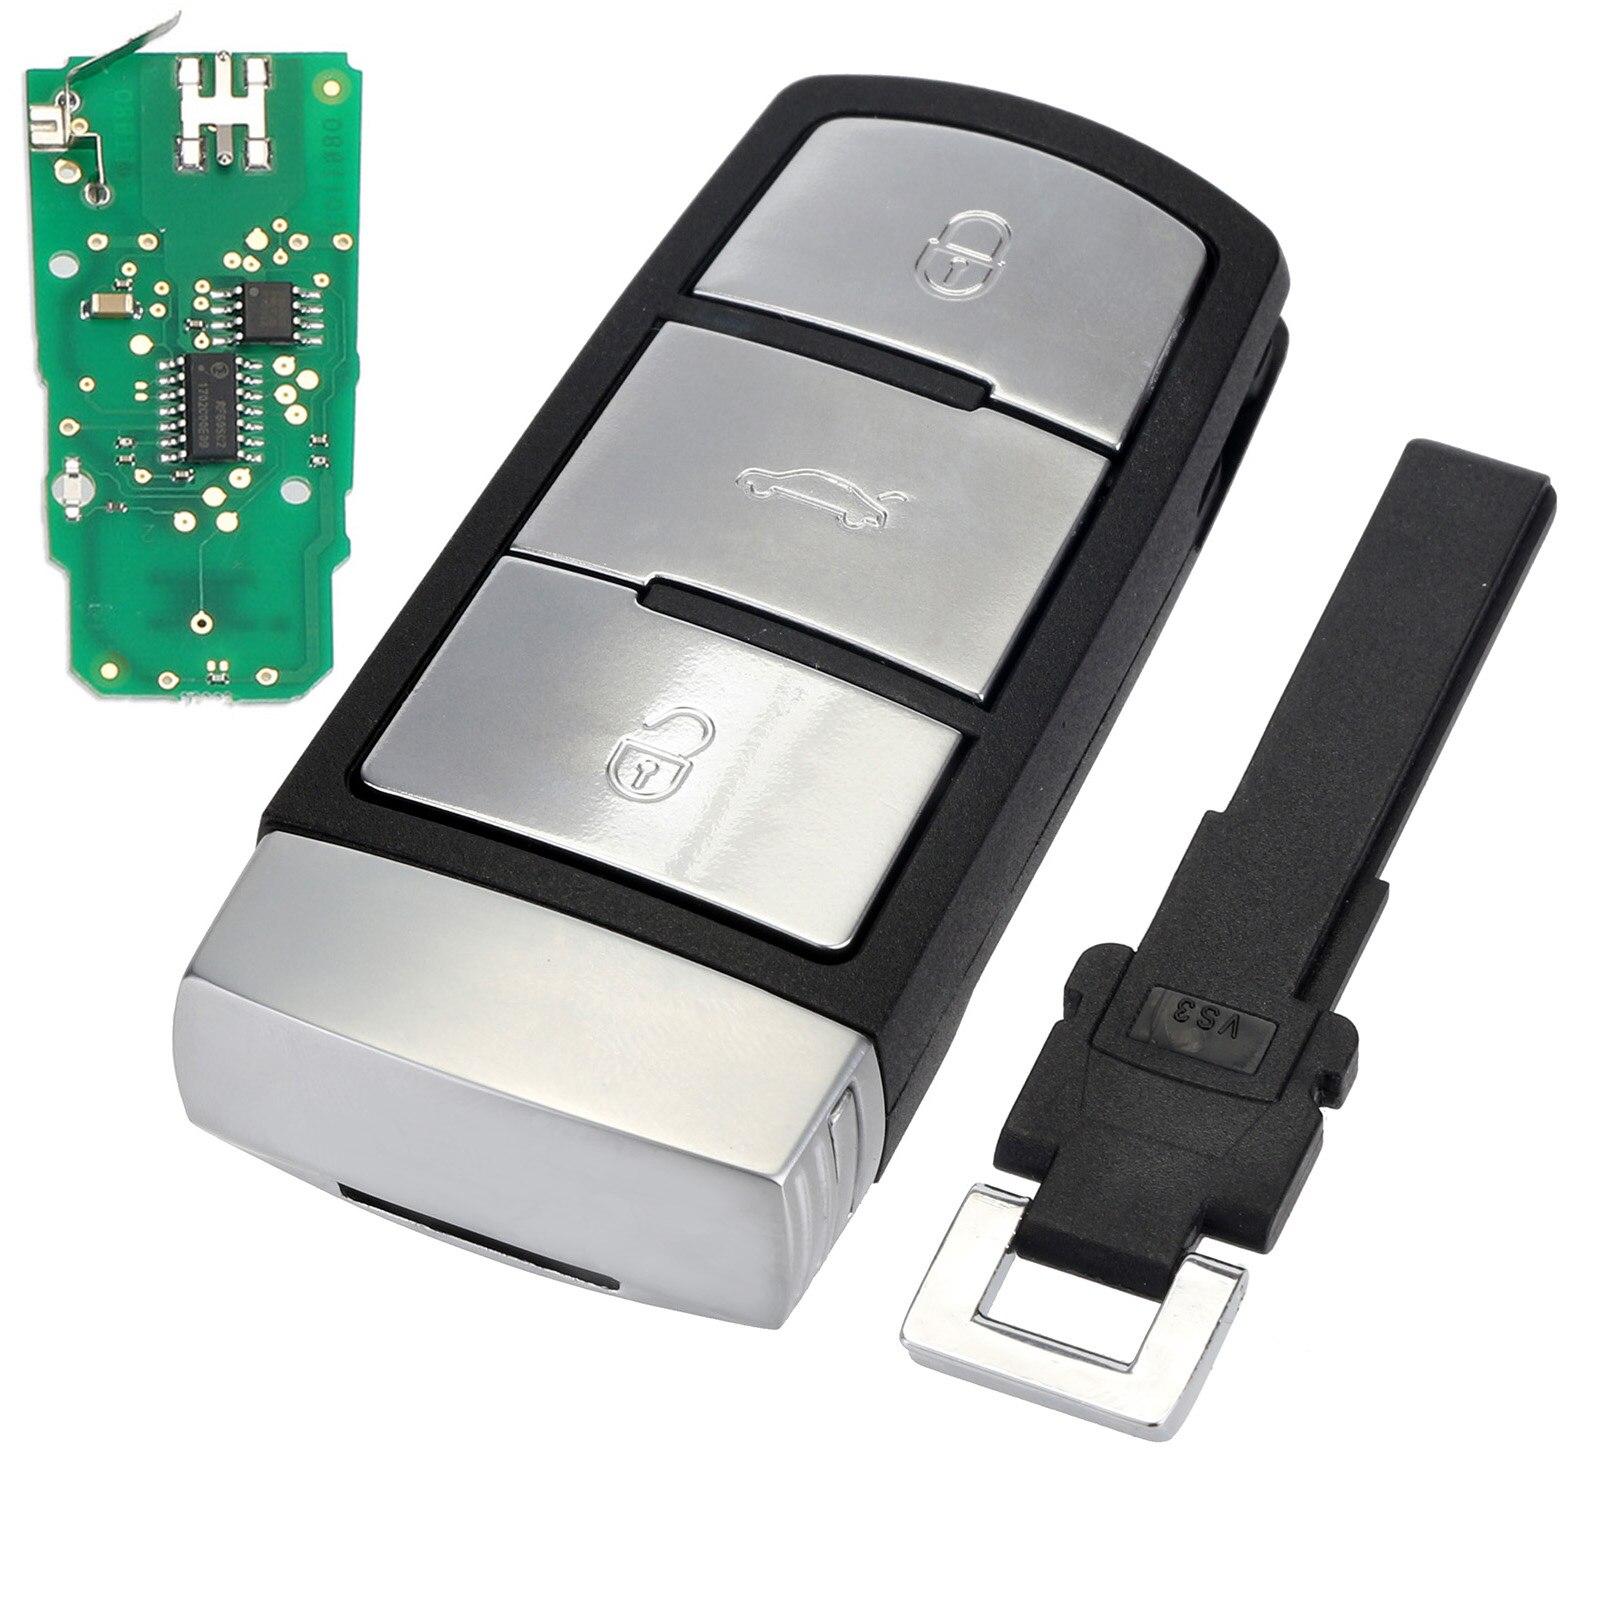 3 Buttons Entry Fob 3C0 959 752 BA Remote Car <font><b>Key</b></font> Shell Case Replacement 433Mhz for VW Passat CC Car <font><b>Key</b></font> D25